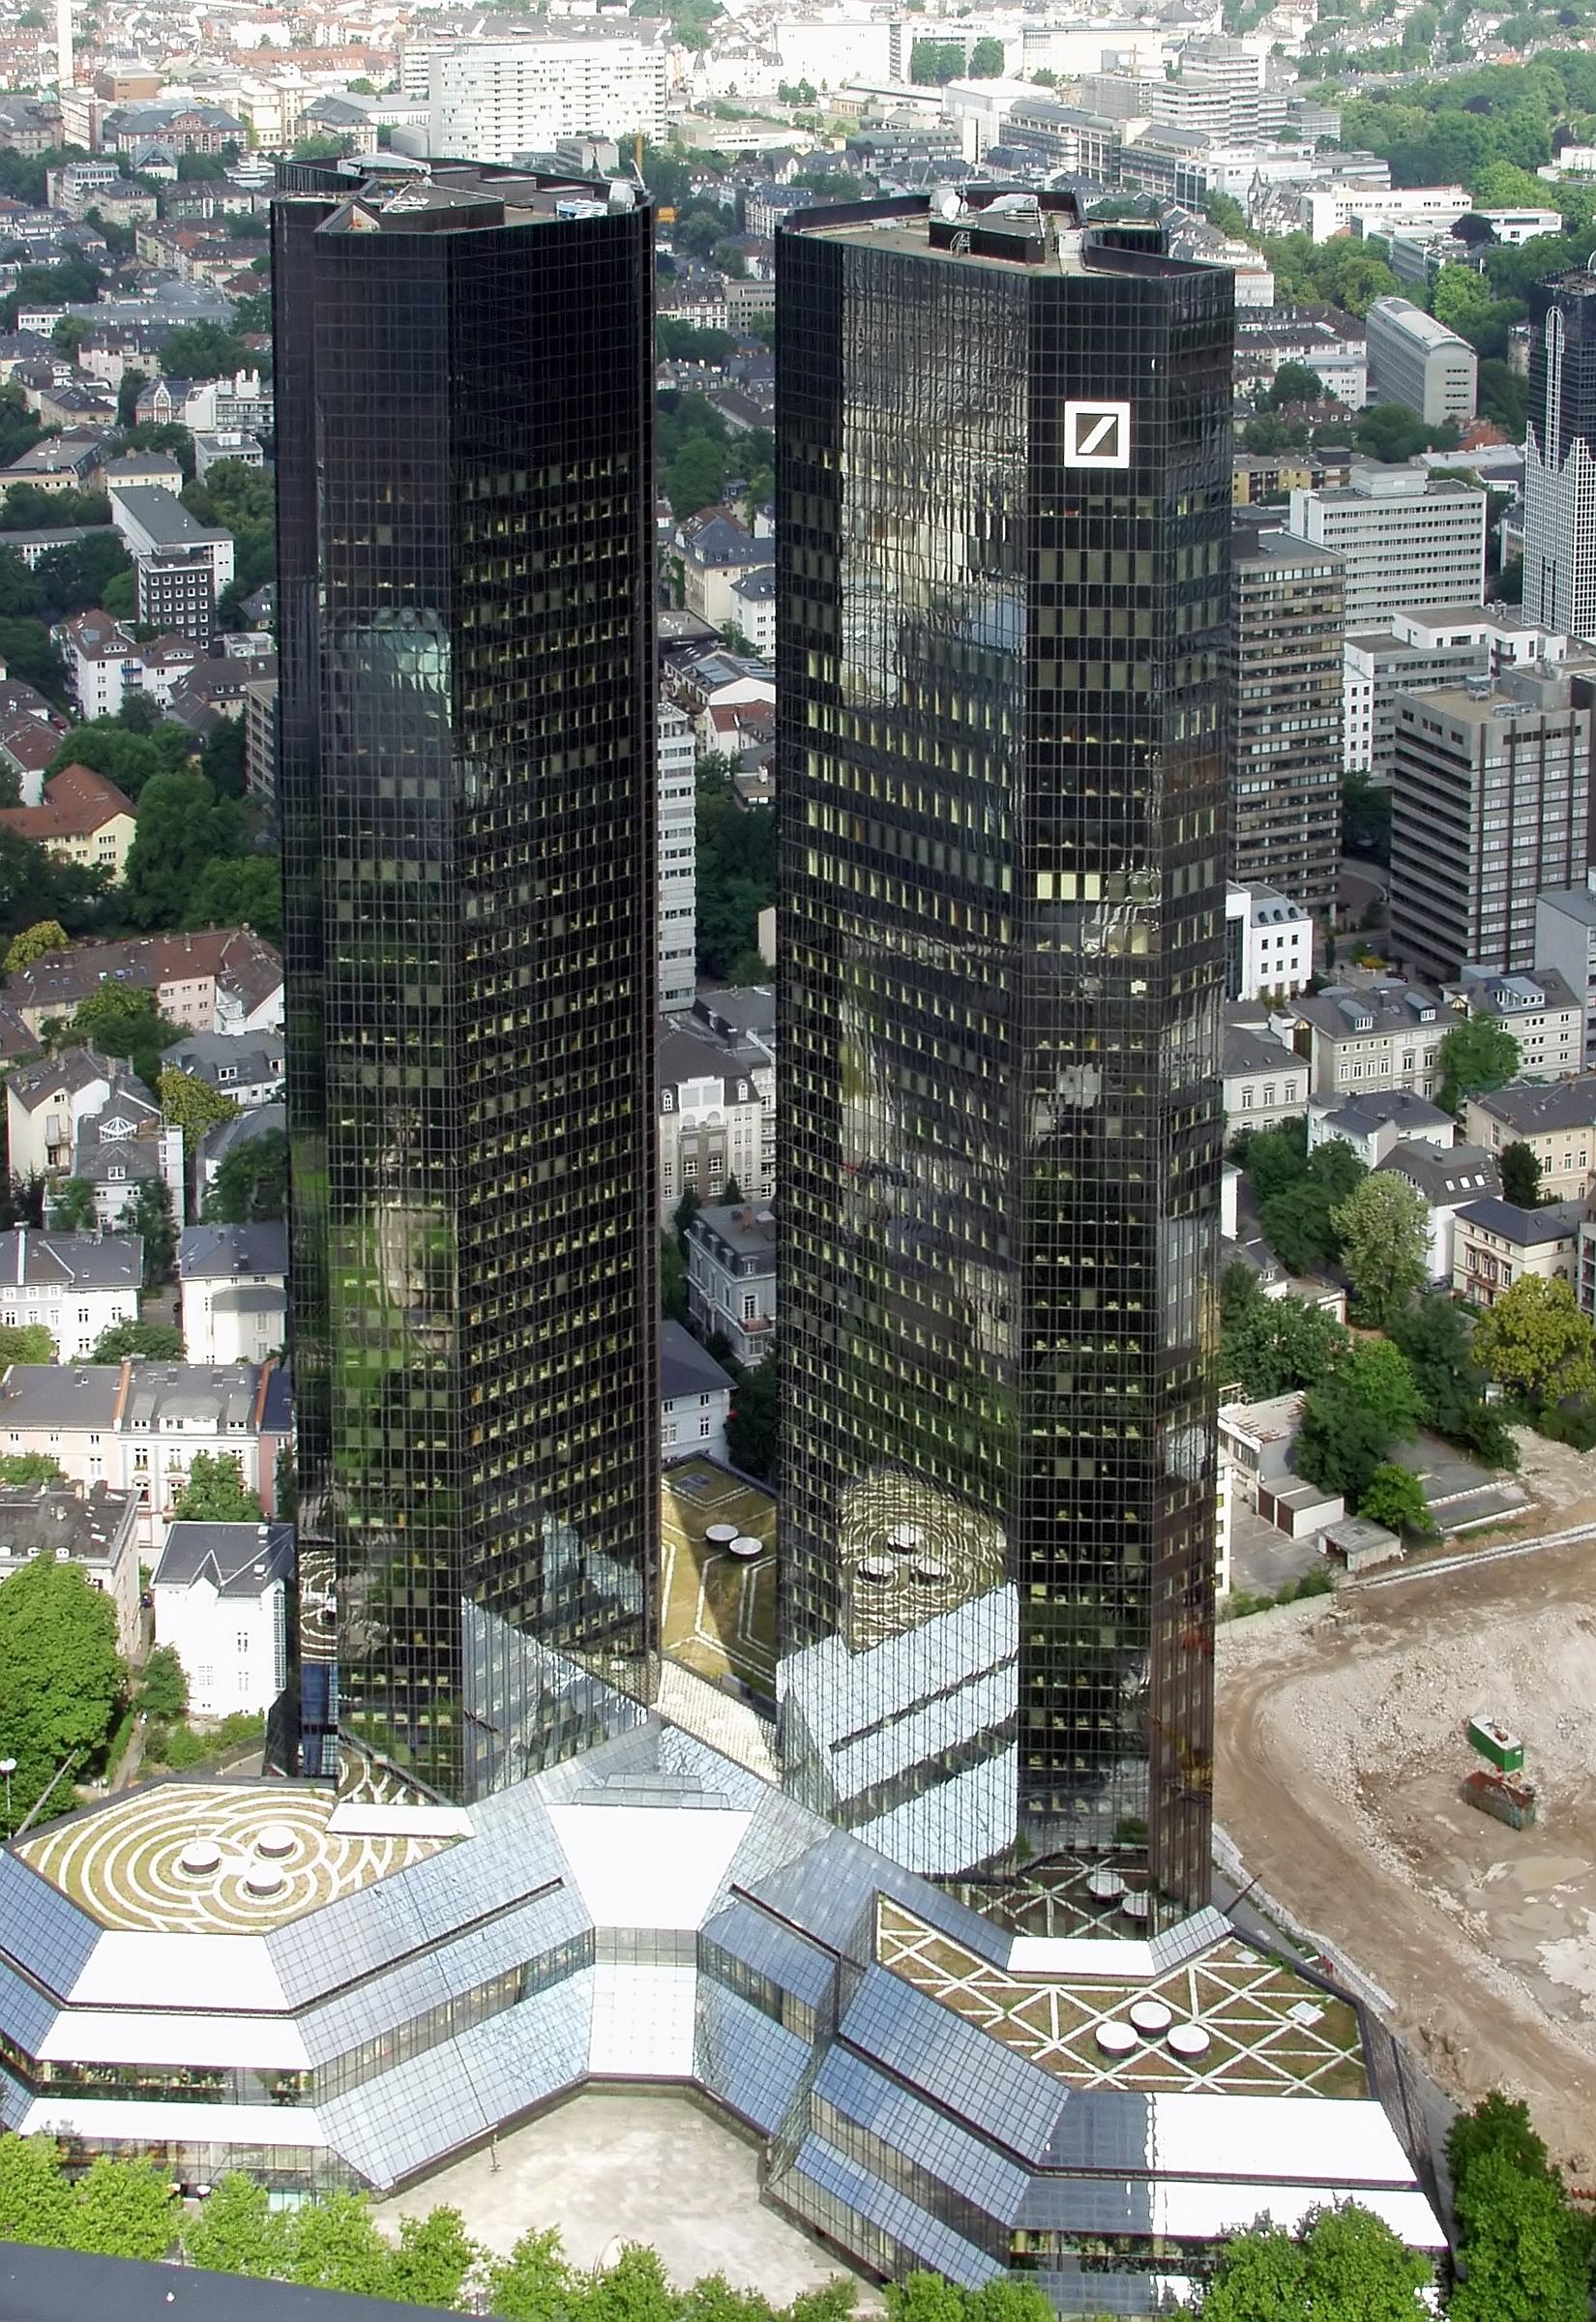 deutsche-bank-frankfurt-am-main. Фото: Wikimedia.org